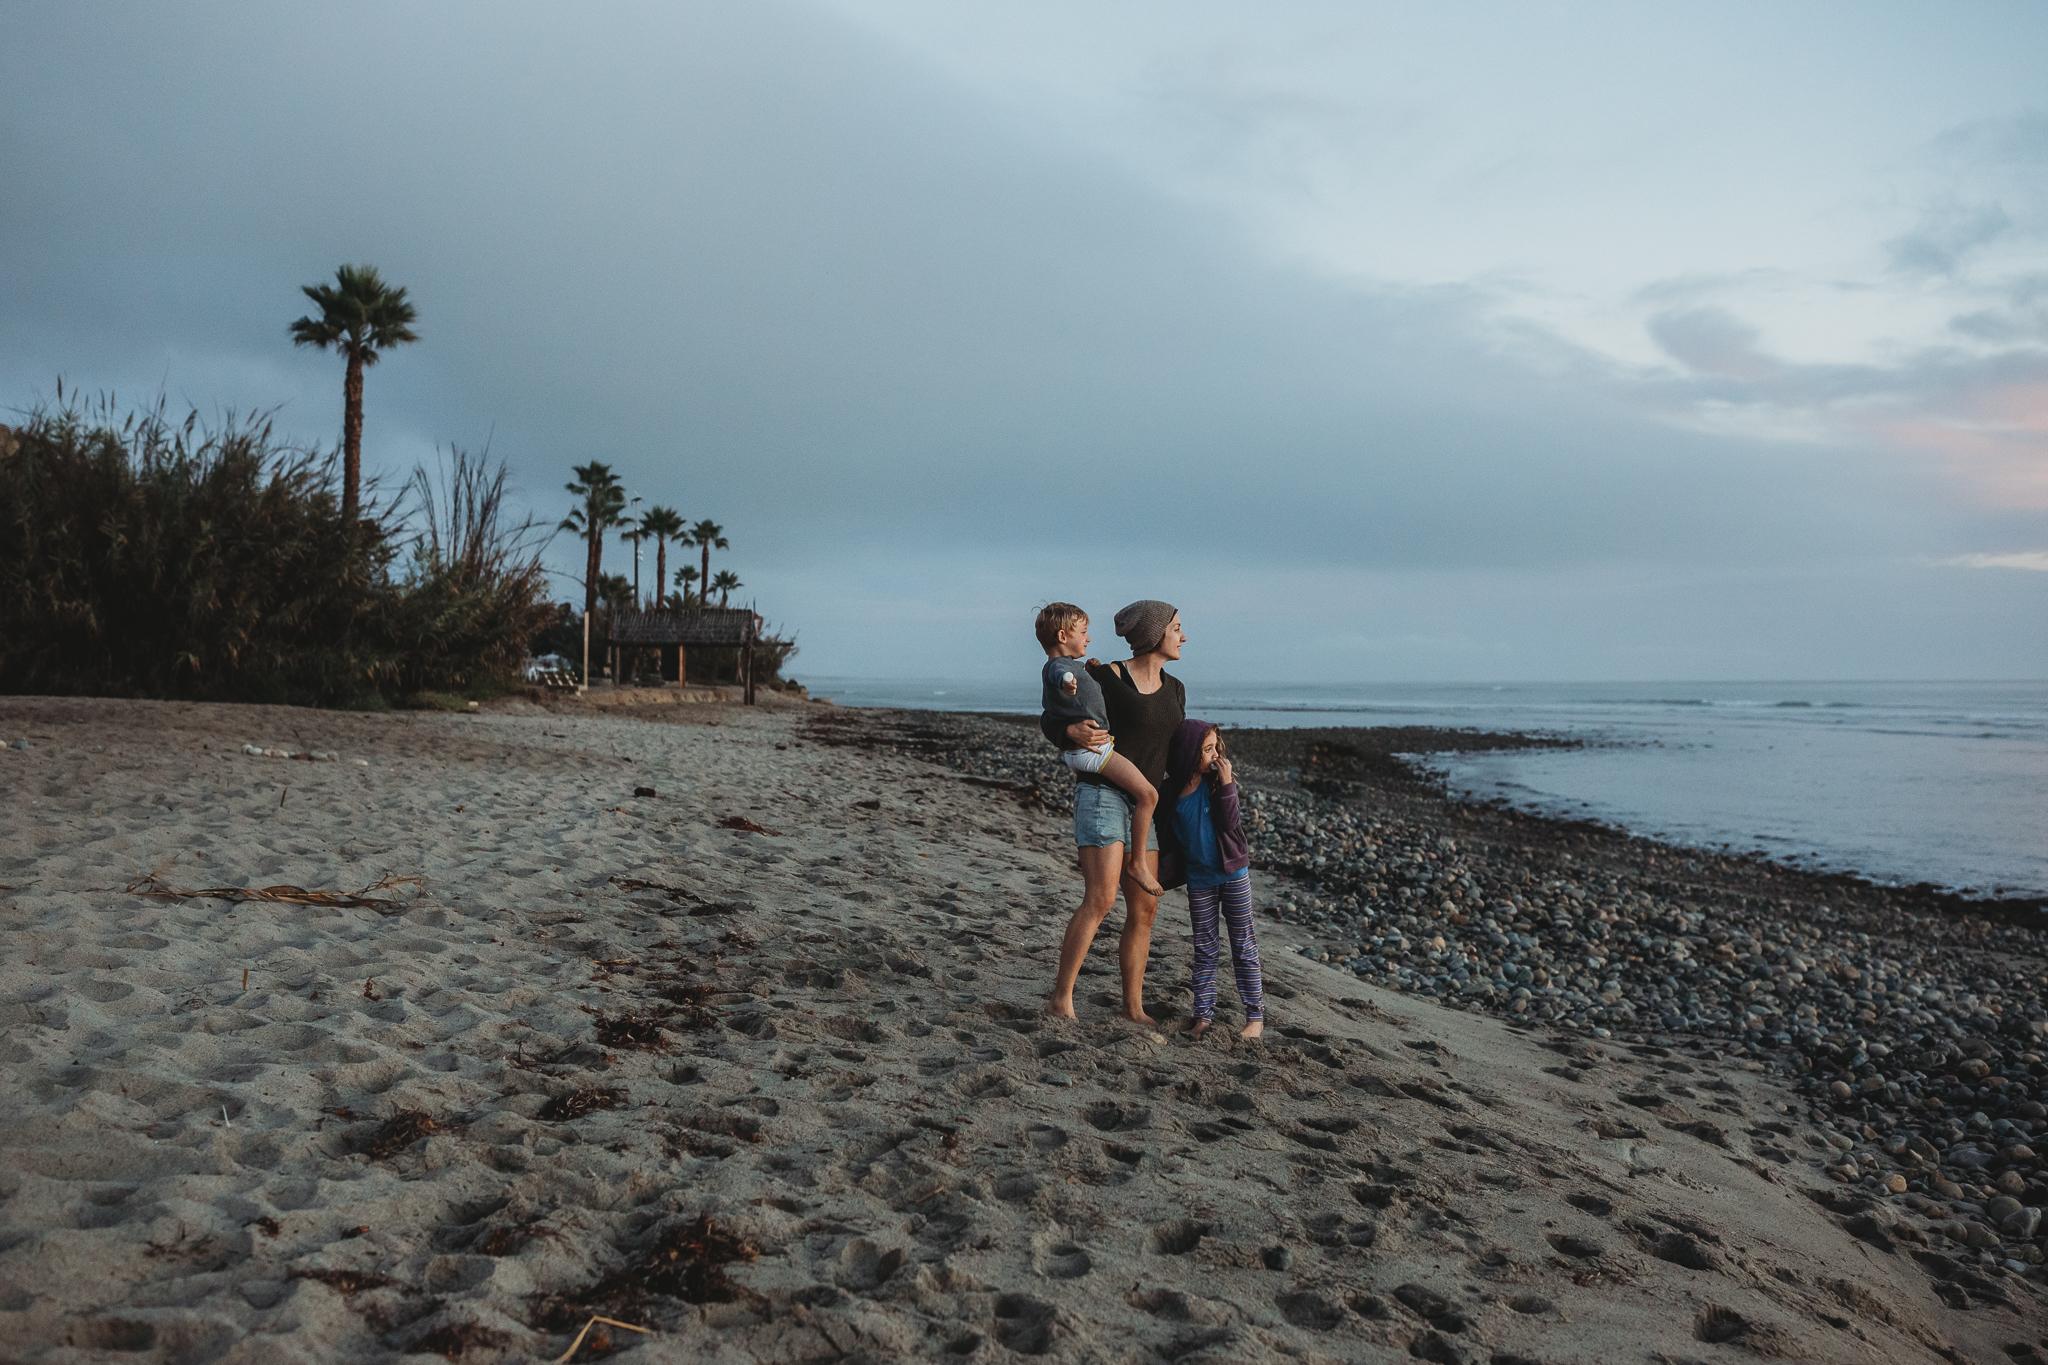 Self portrait: Spring break, post-divorce at our favorite beach